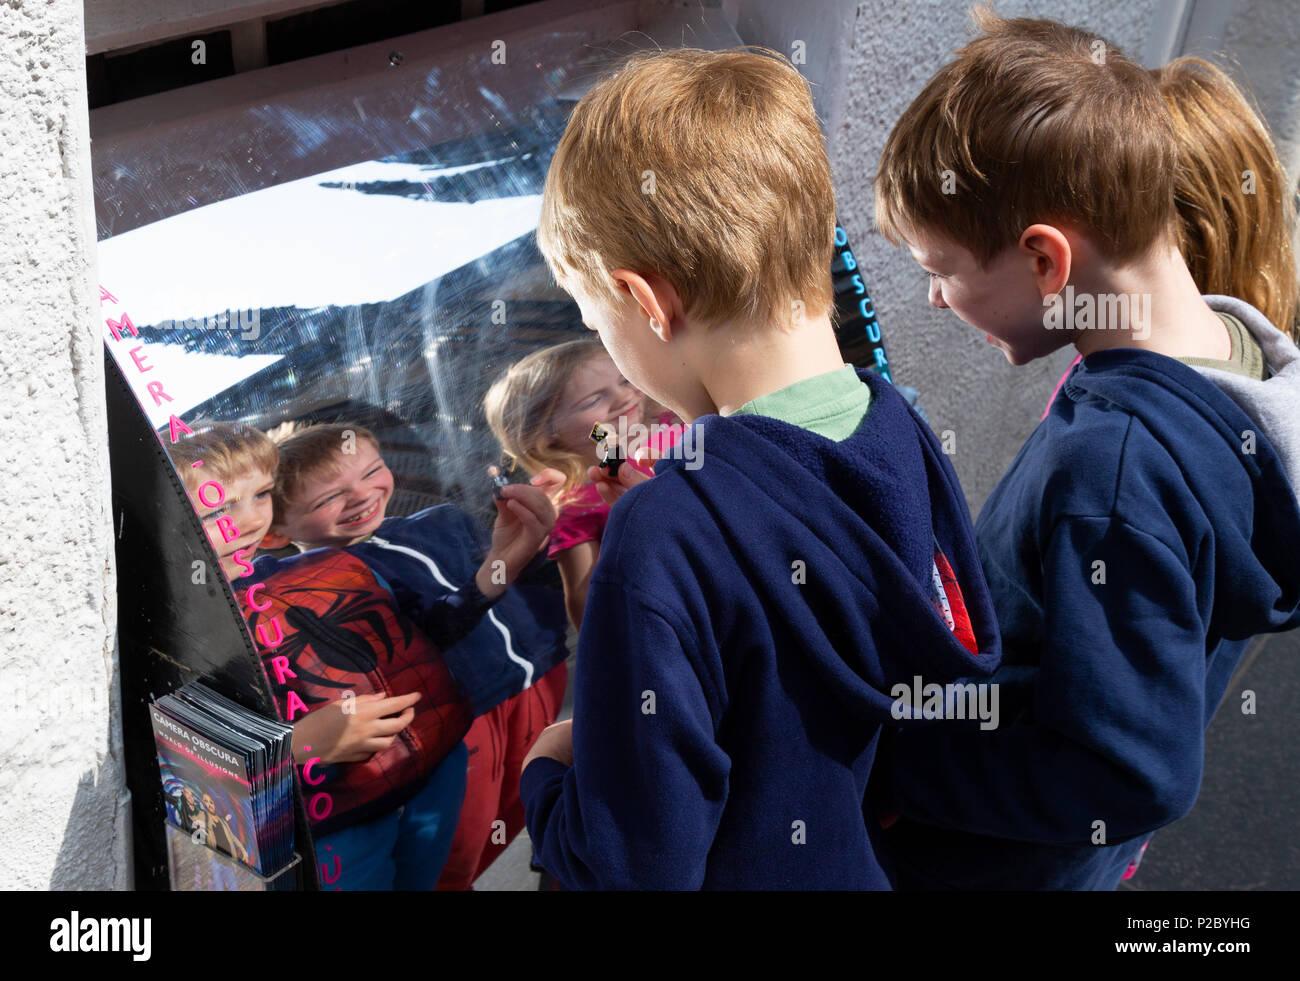 Happy children having fun with their reflection in a distortion mirror, Edinburgh. Scotland UK - Stock Image